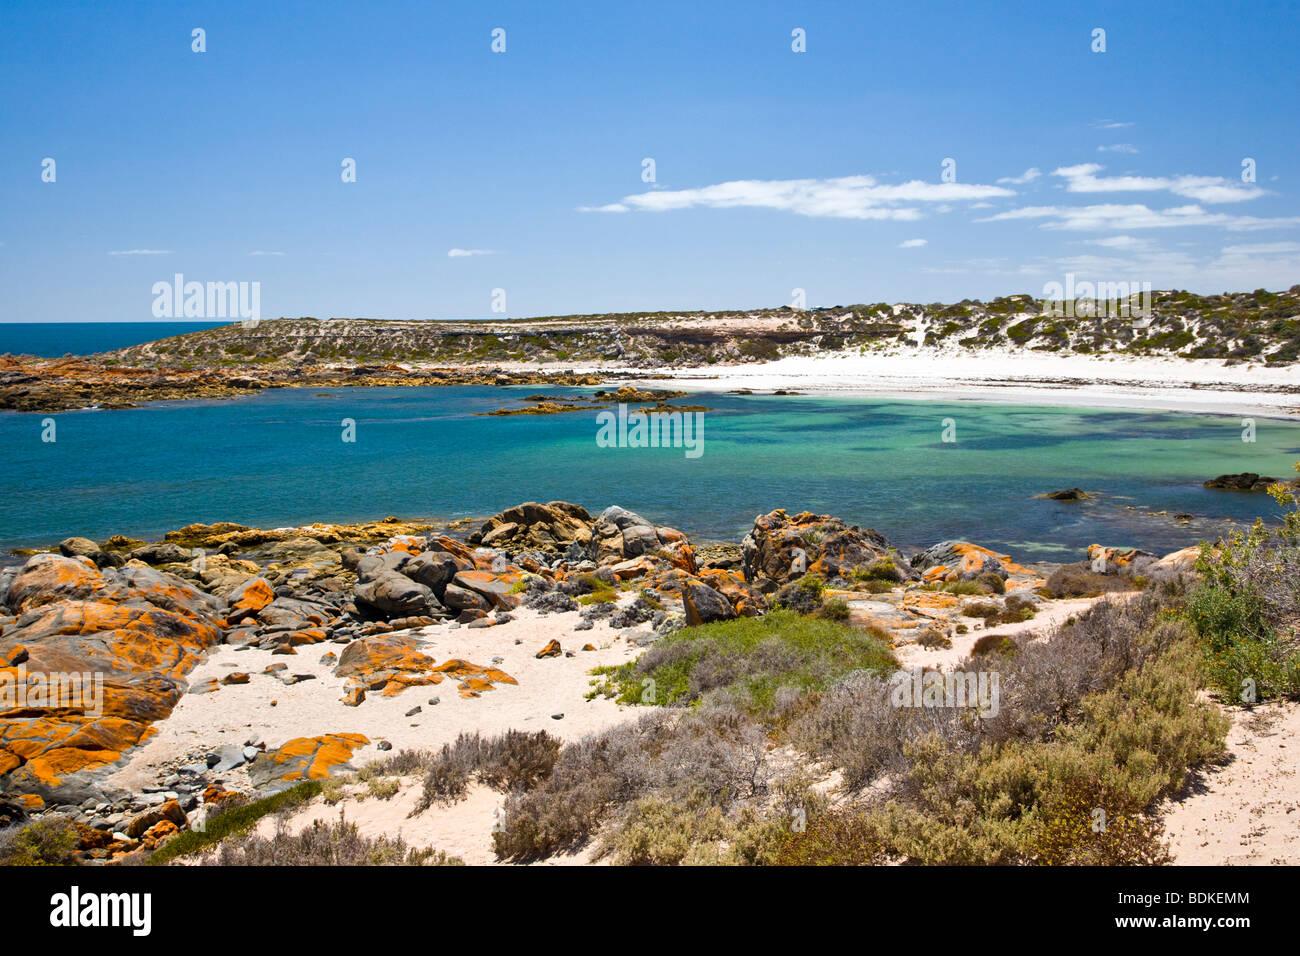 Corny Point, Yorke Peninsula, South Australia - Stock Image